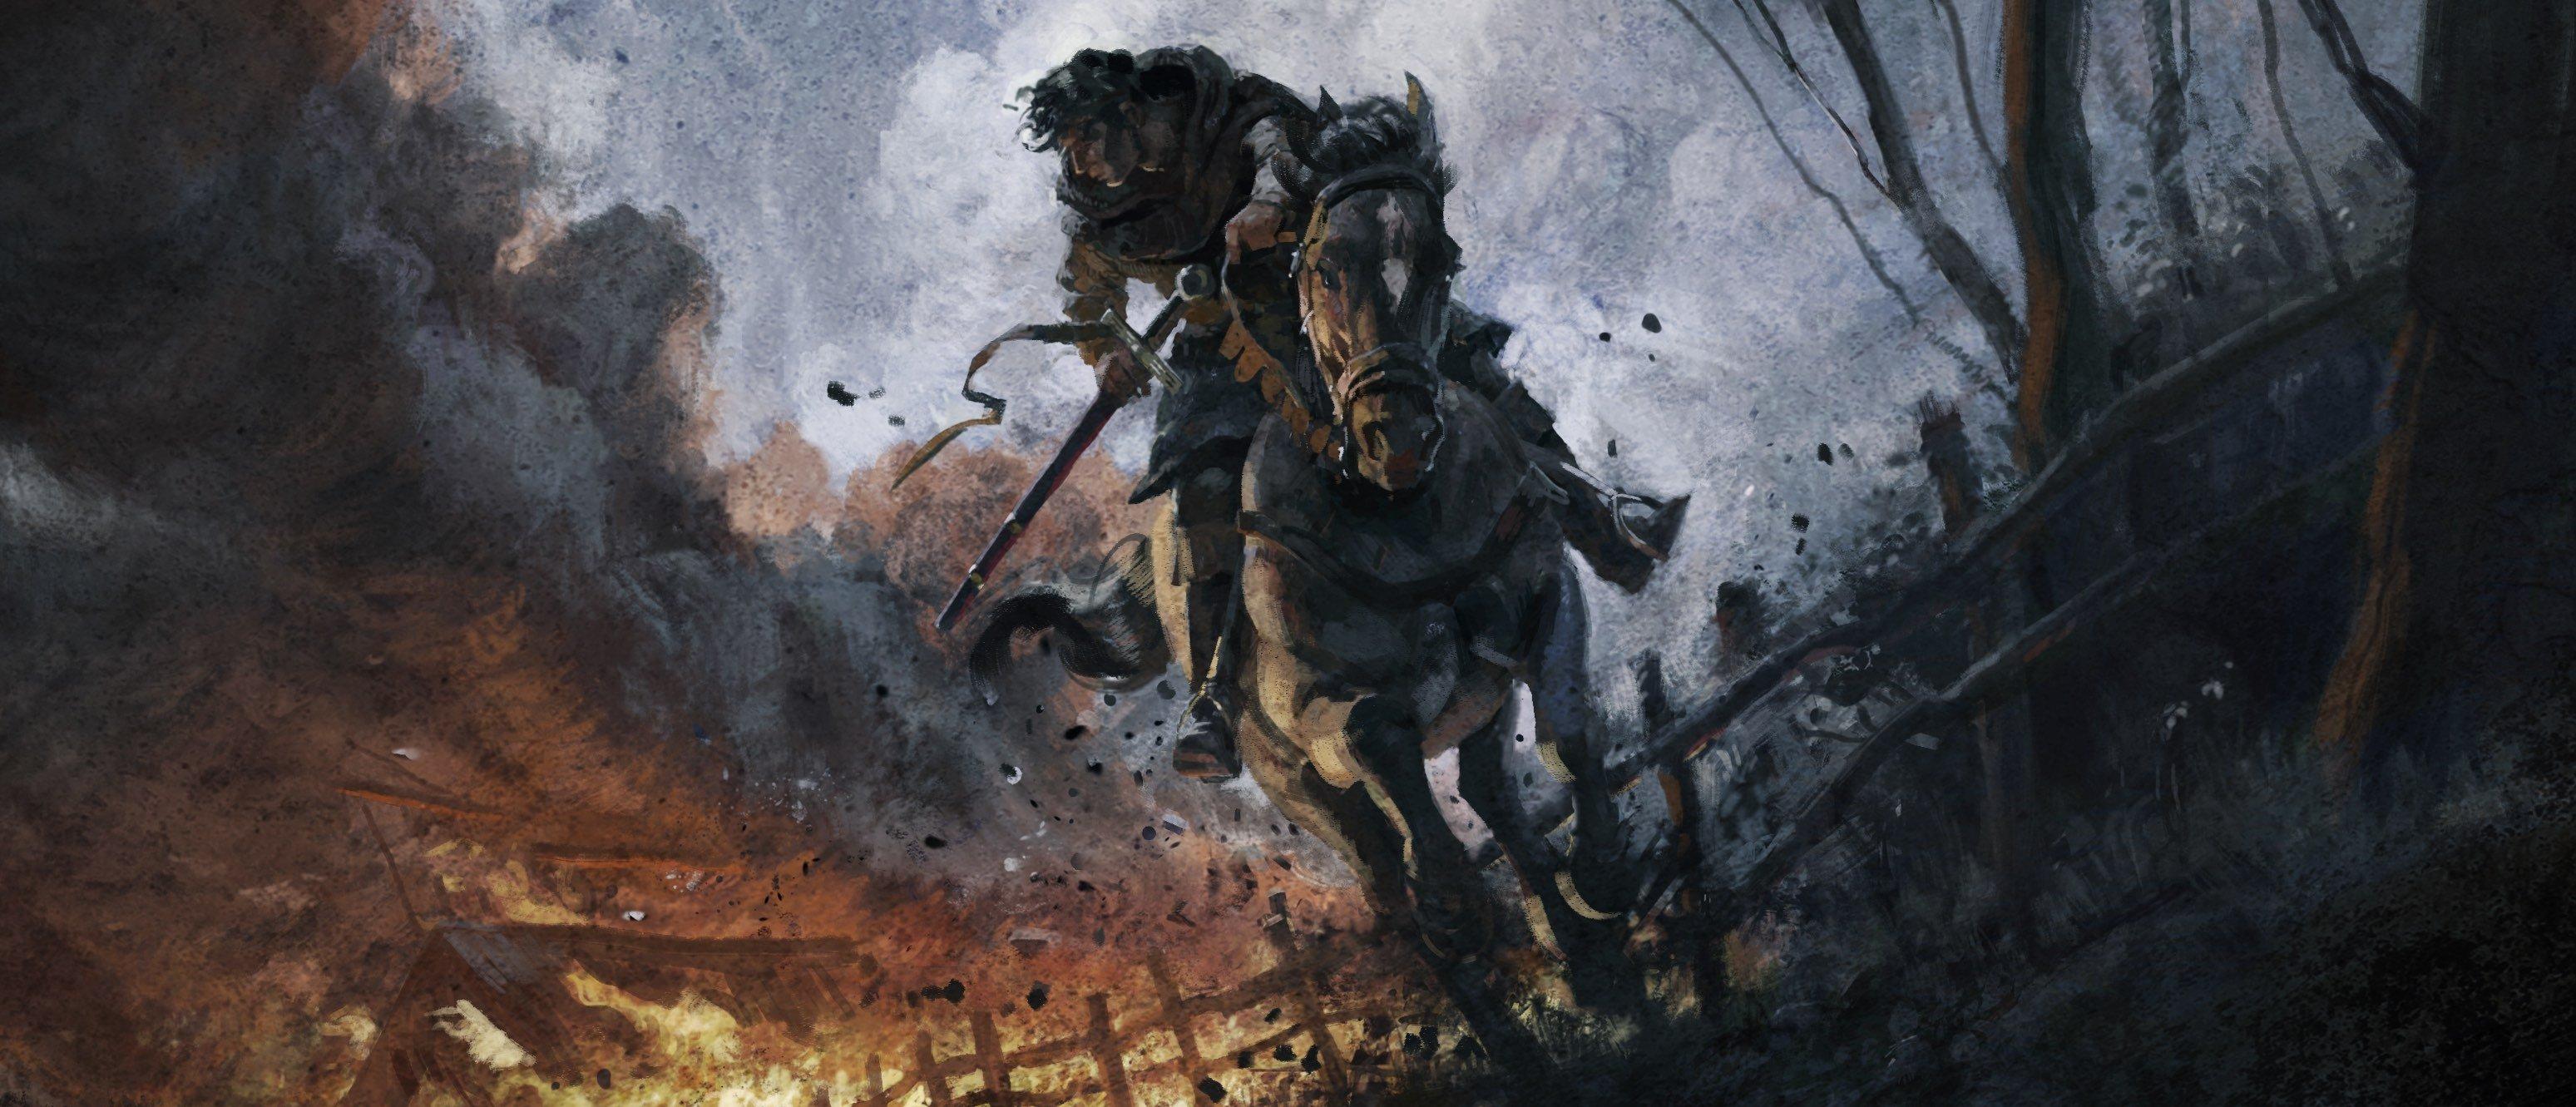 kingdom come: deliverance disgusting men отвратительные мужики